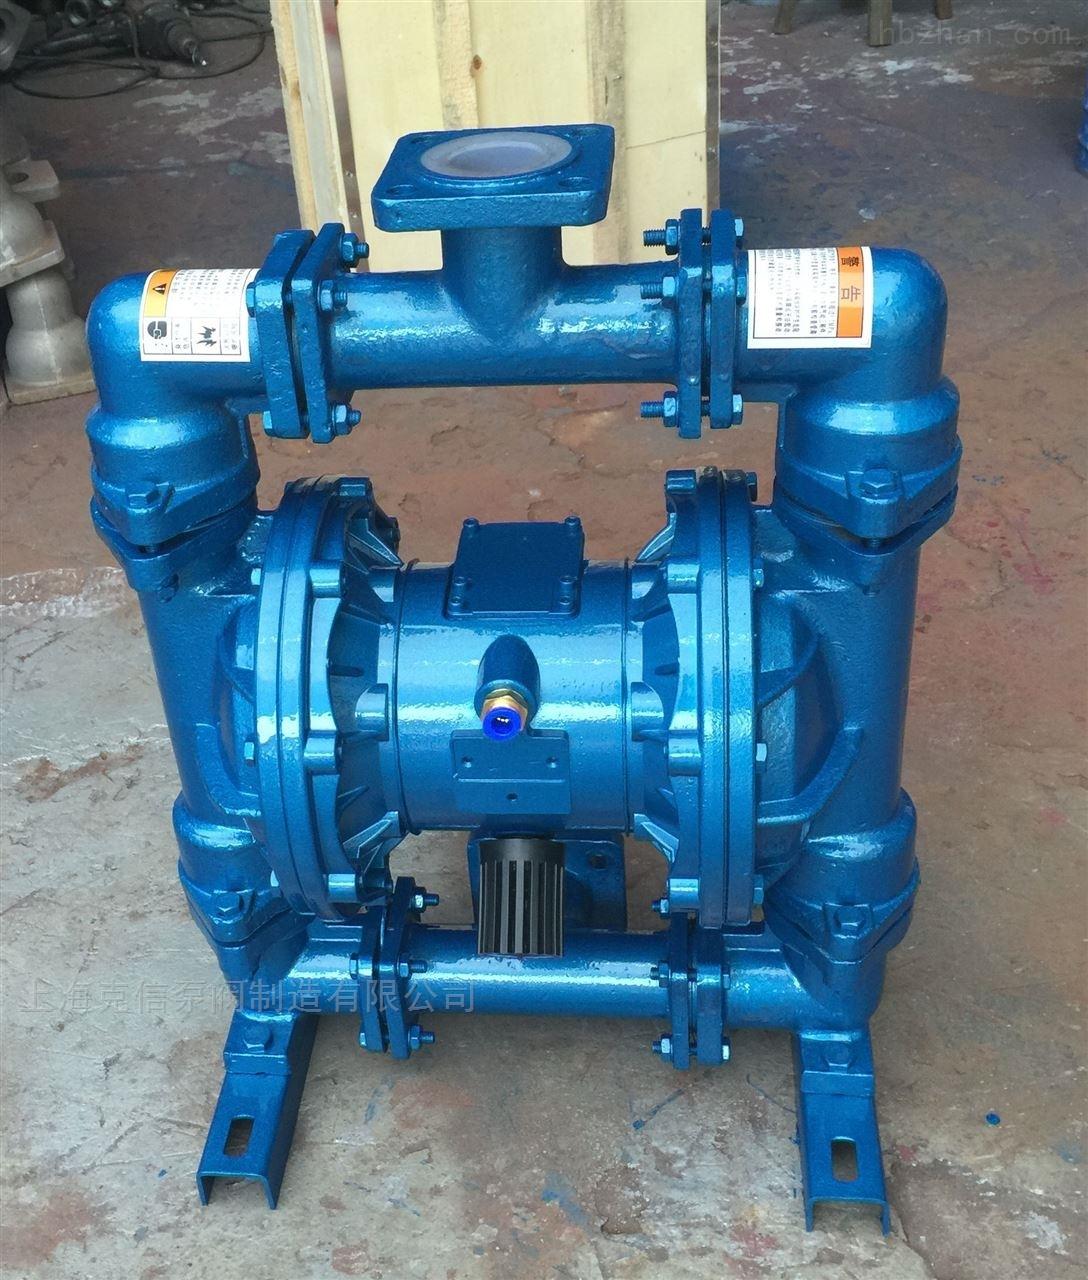 QBY-25衬氟气动隔膜泵